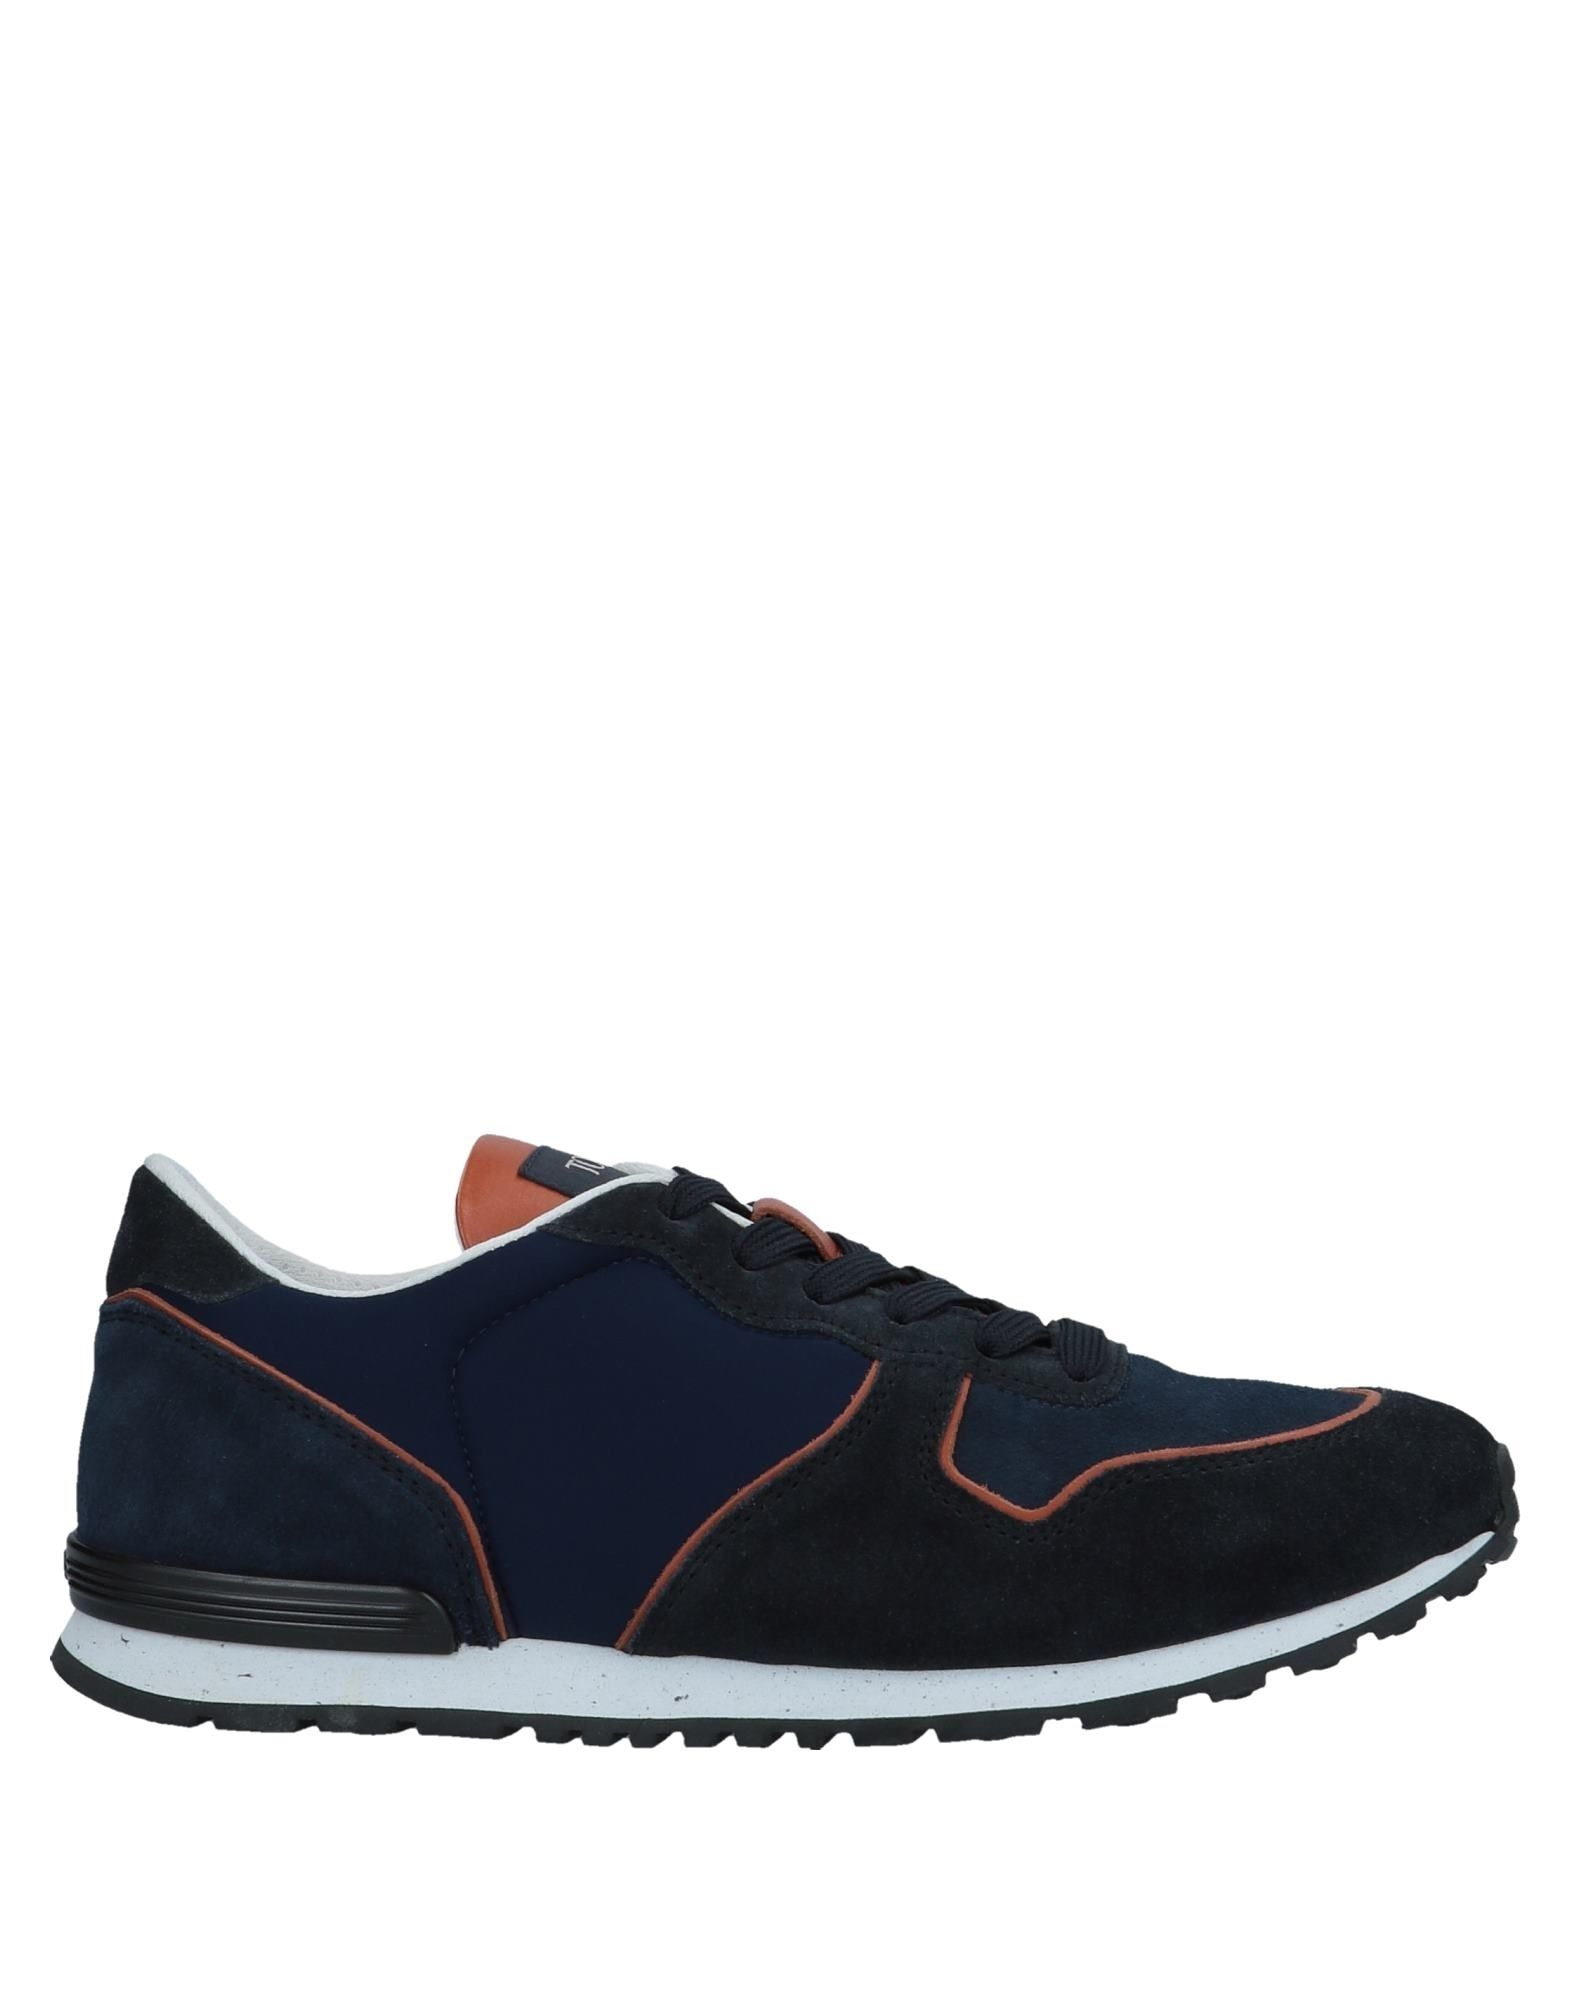 Tod's  Sneakers Herren  Tod's 11541133SK Heiße Schuhe cbc57e